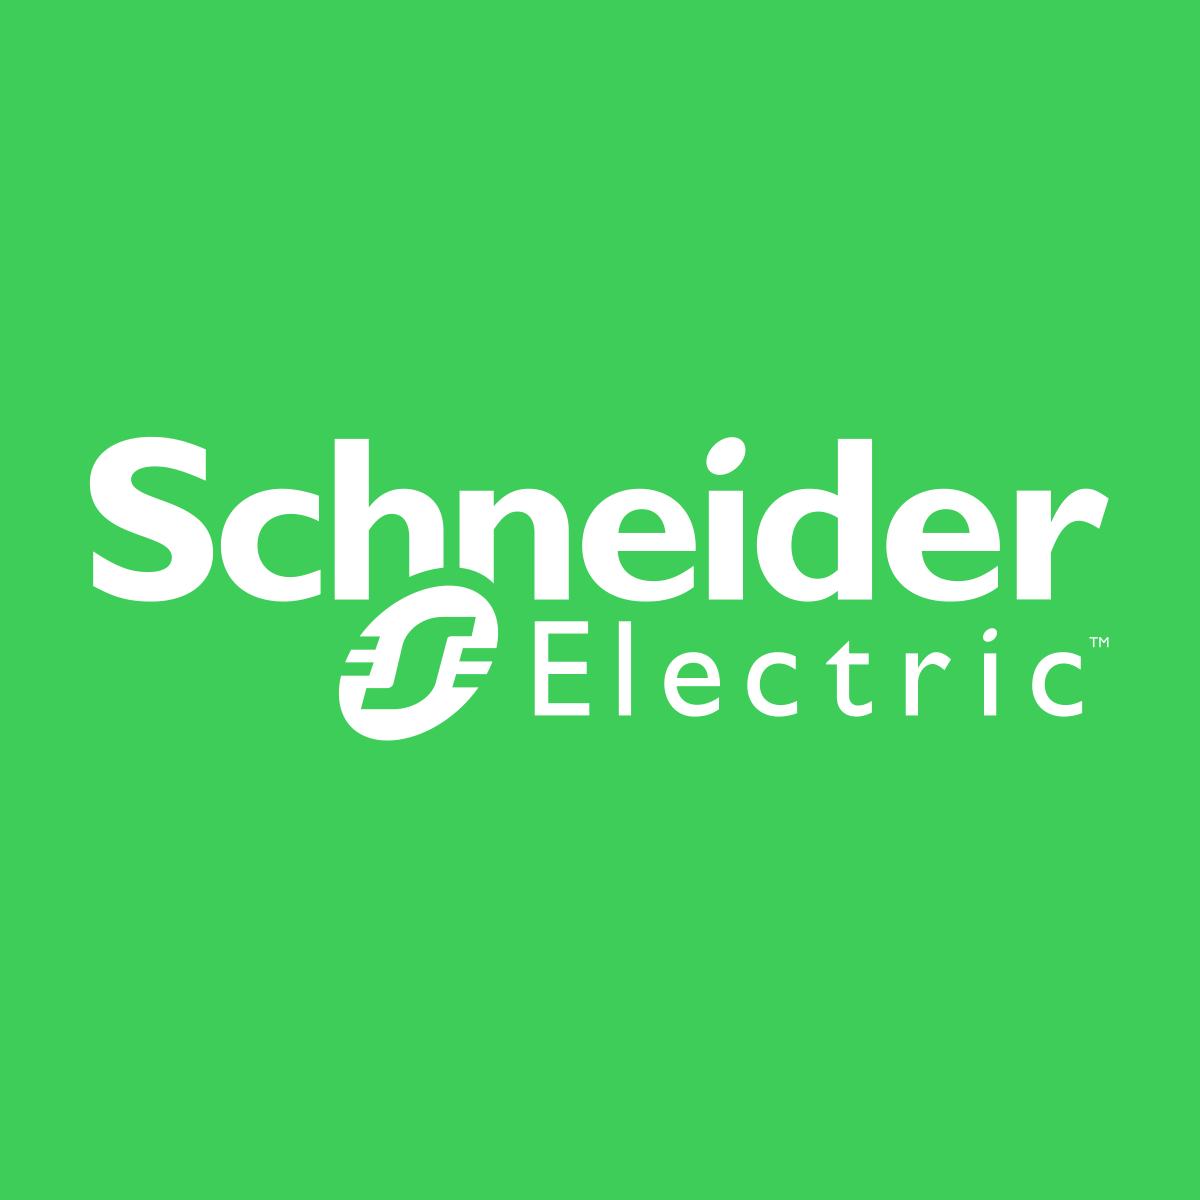 Oferta de práctica empresa Schneider Electric